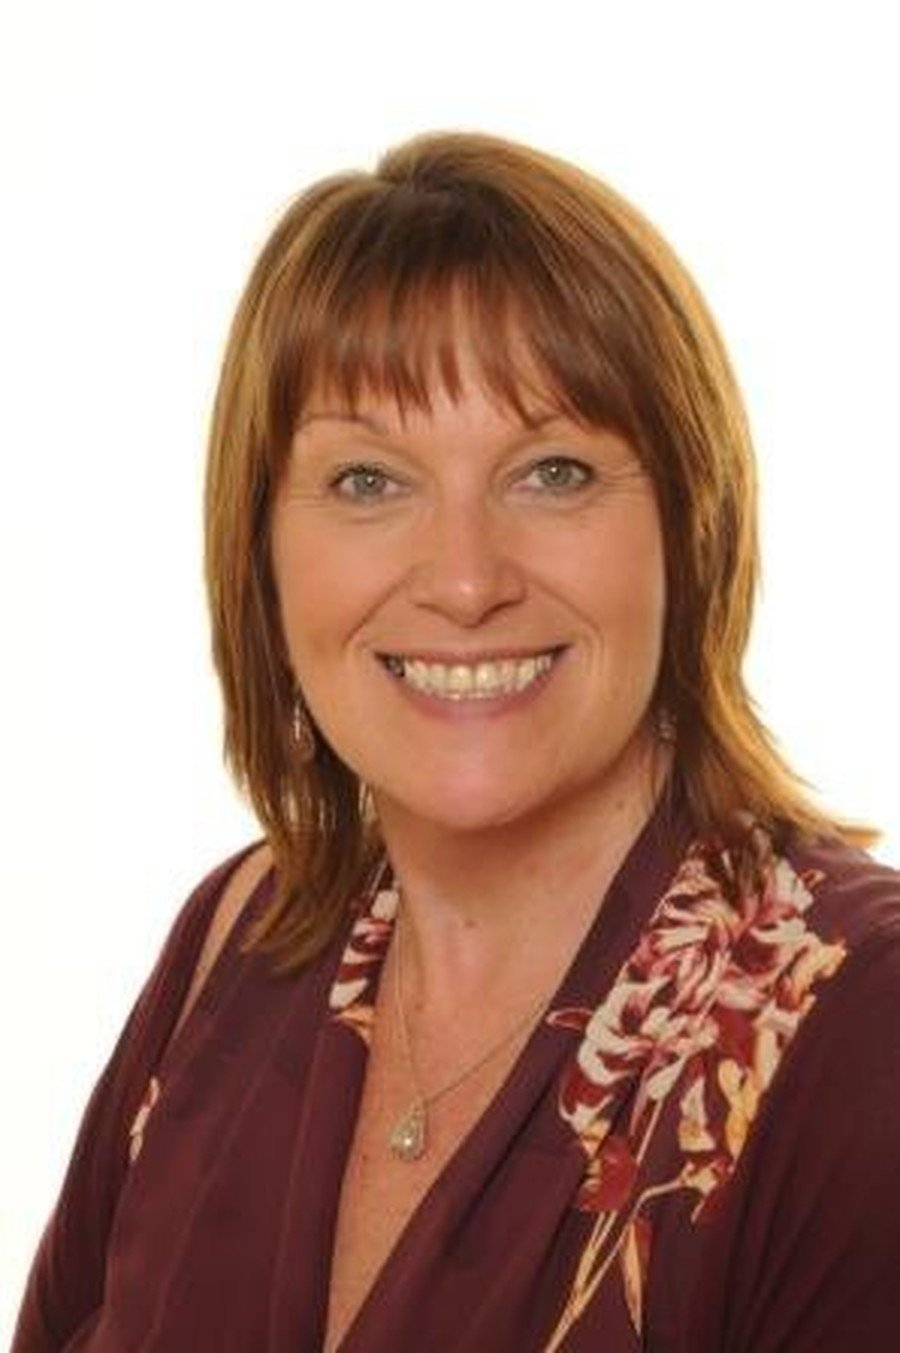 Mrs Linda Laird, Headteacher and Designated Safeguarding Lead